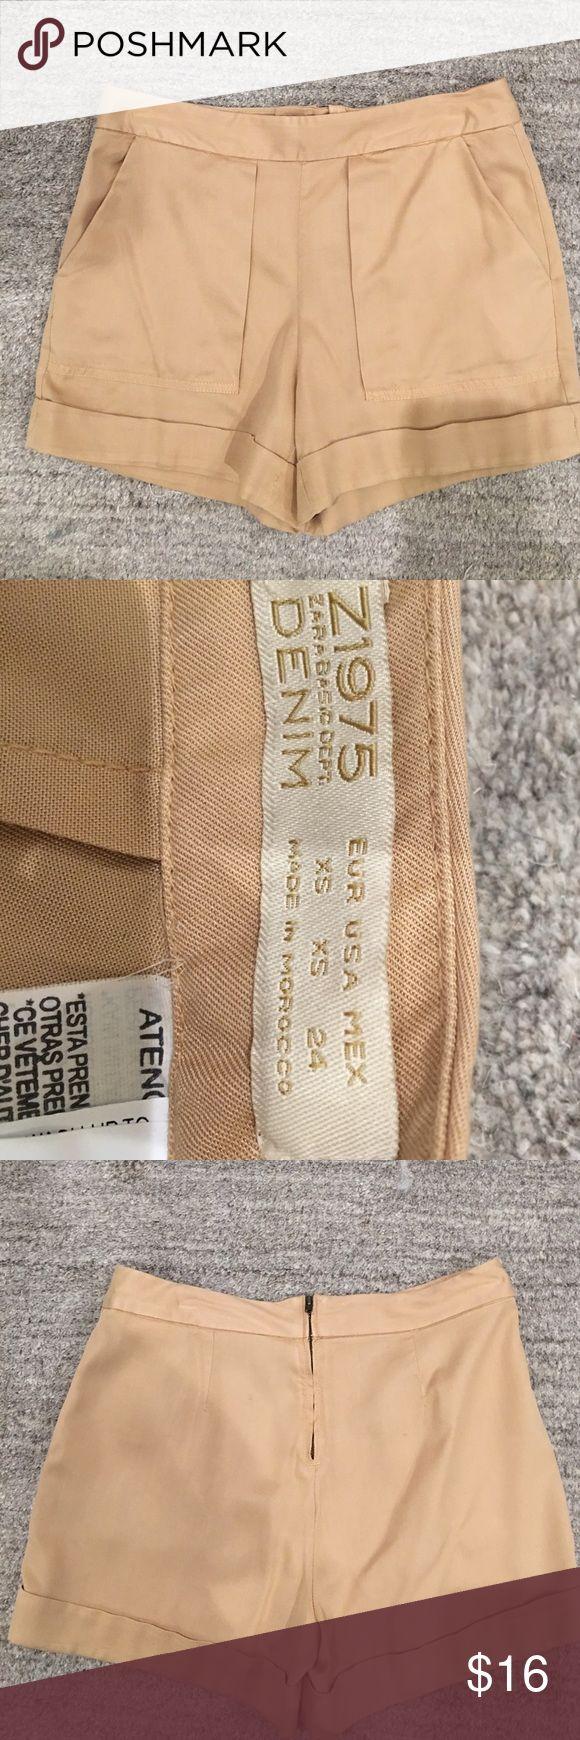 NWOT Zara Shorts NWOT 100% lyocell safari style shorts. Zip up back. Great basic. Never worn. Brand new. Zara Shorts